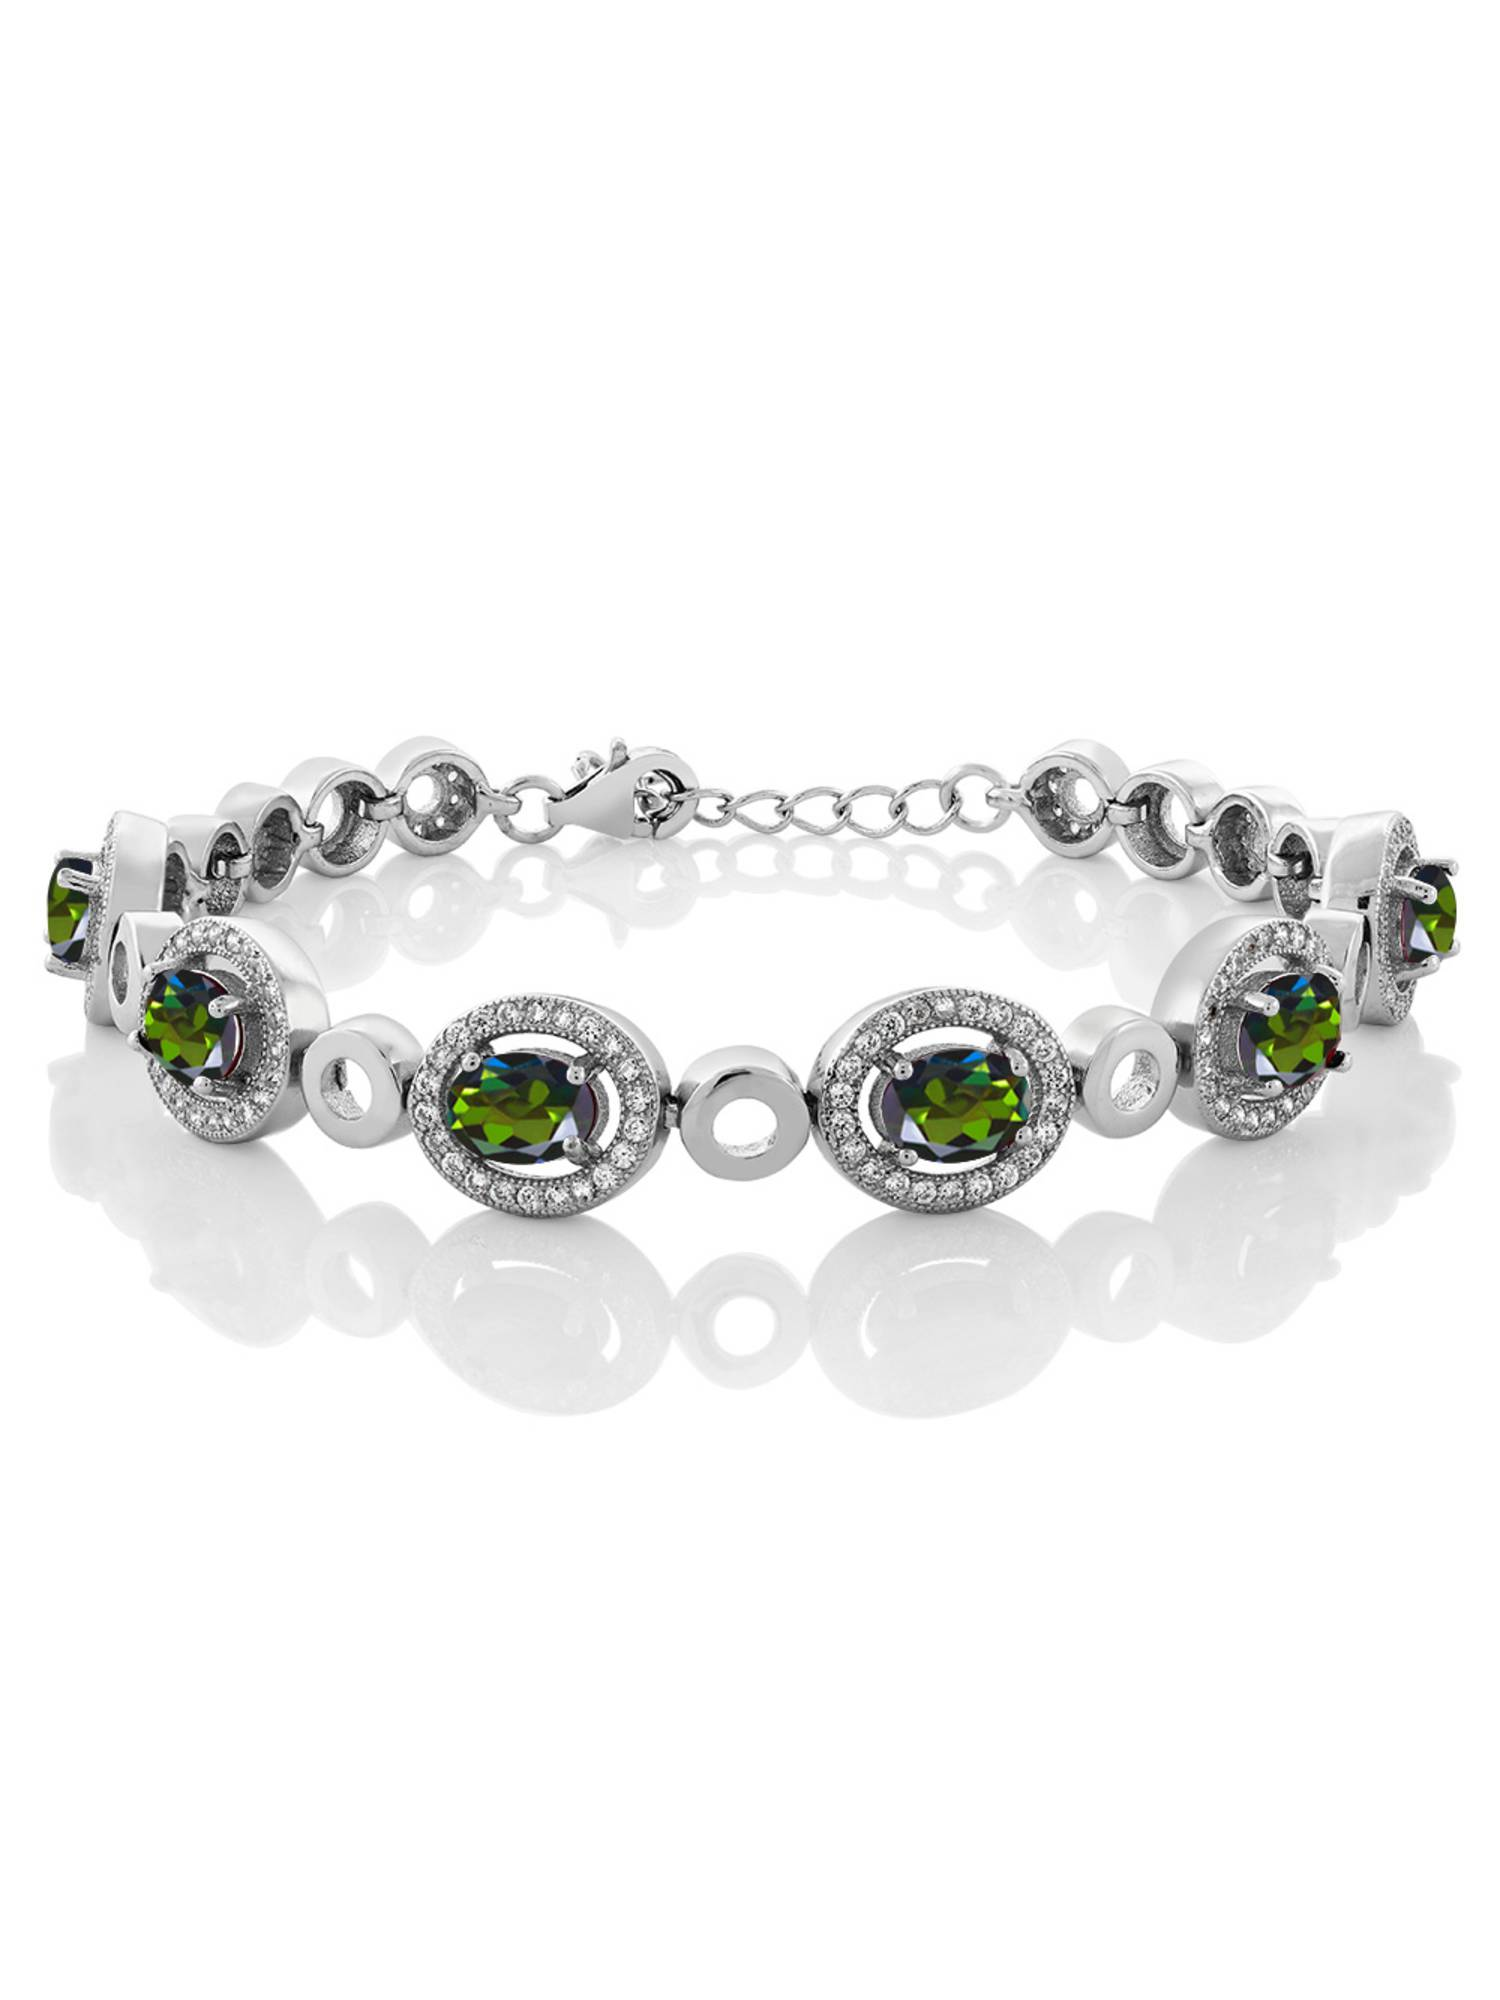 6.72 Ct Oval Tourmaline Green Mystic Topaz 925 Sterling Silver Bracelet by